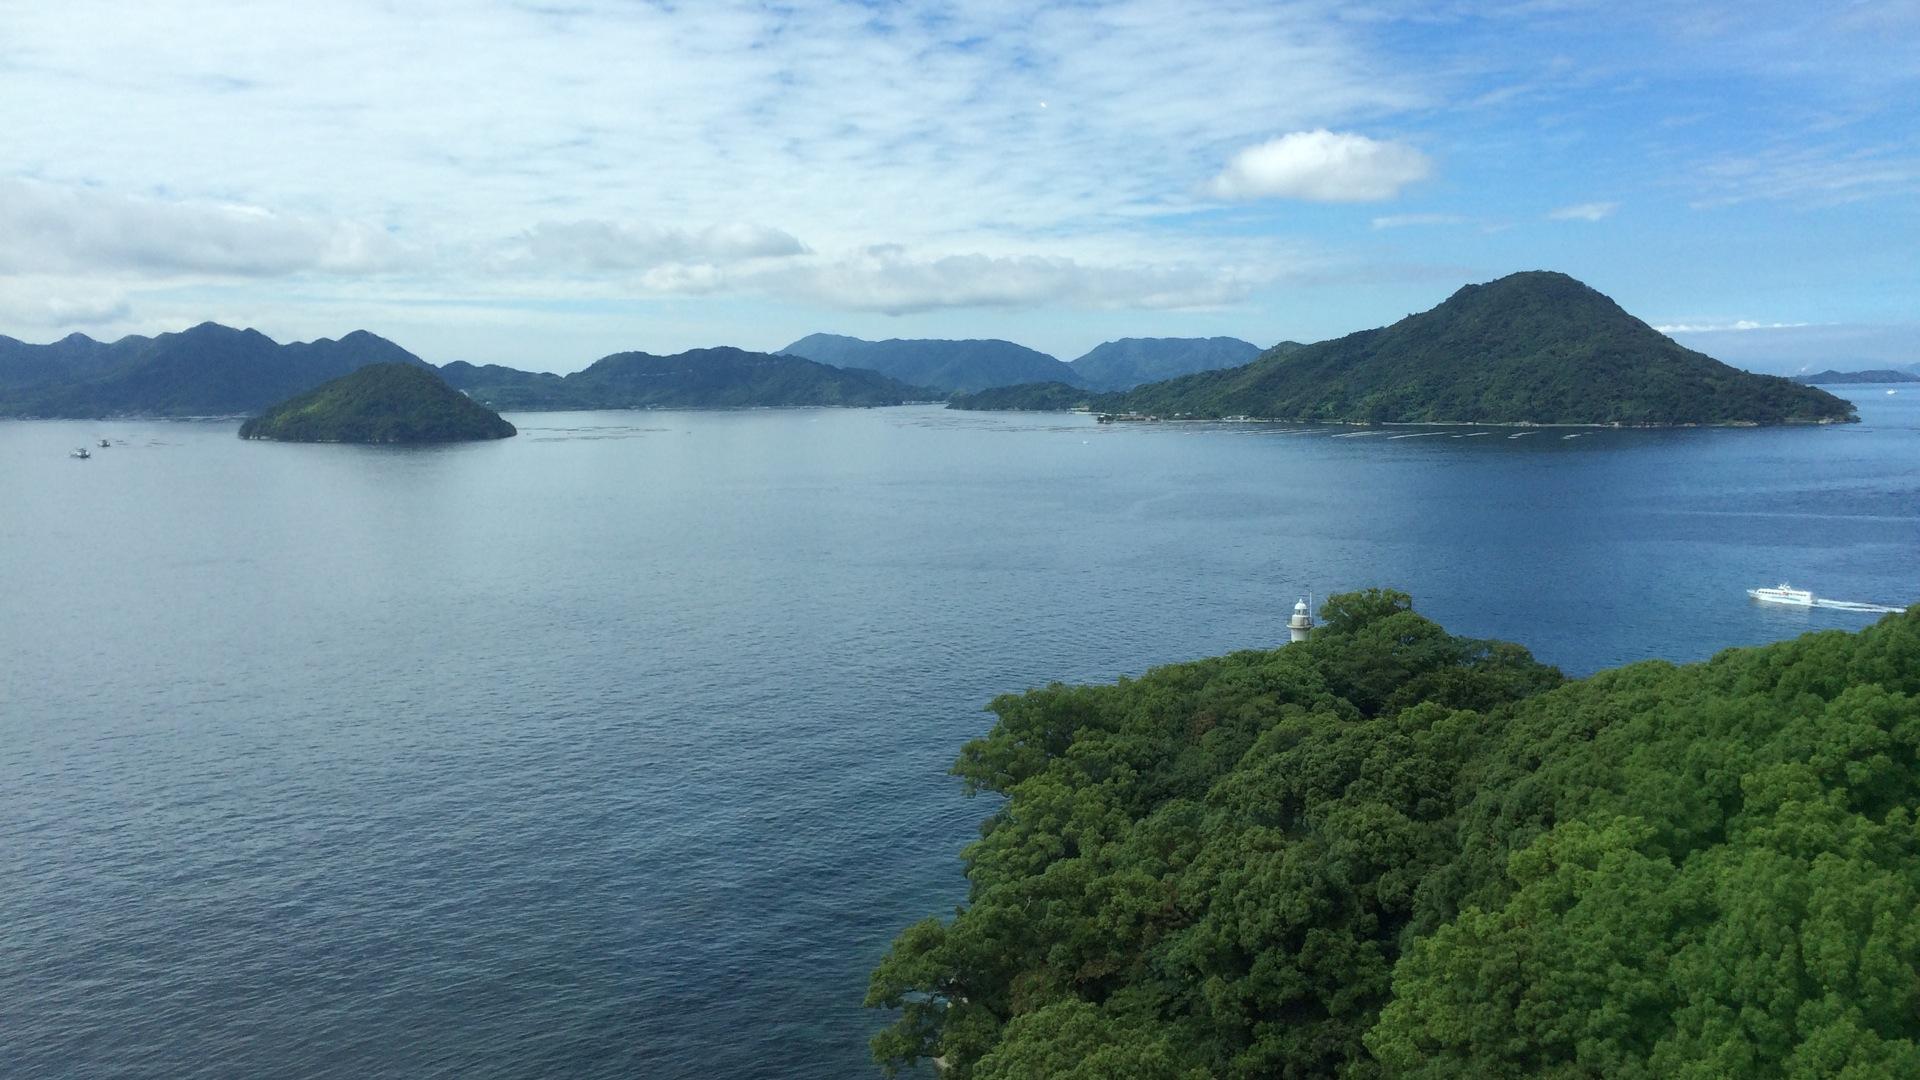 Bucht von Hiroshima mit den Inseln Nanoshima, Onasabi und Itsukushima (Miyajima)